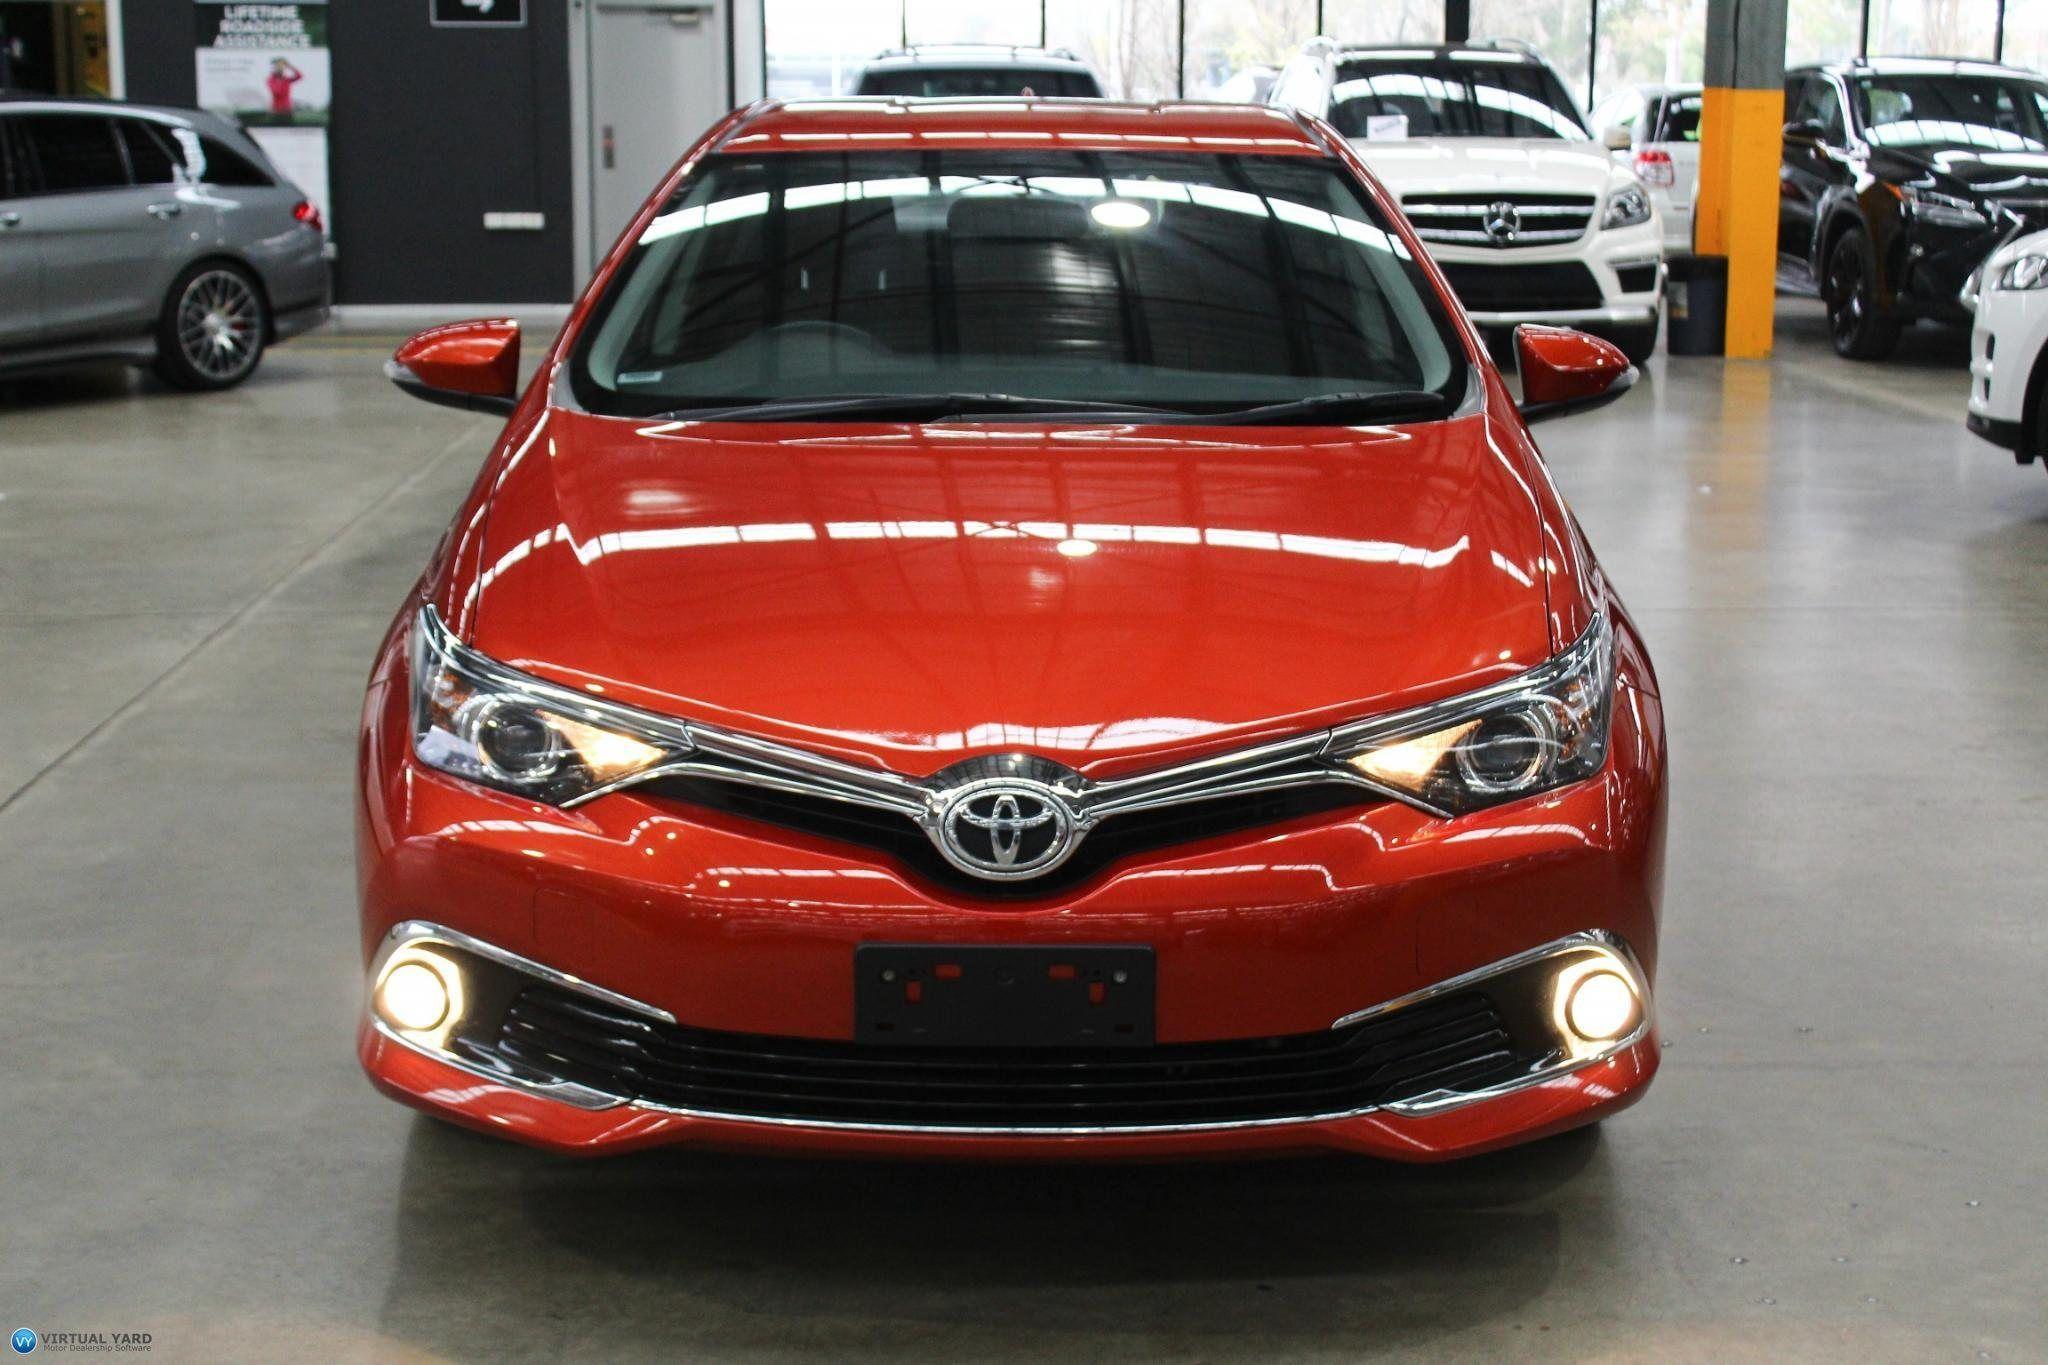 2021 Toyota Auris Redesign And Concept Toyota Auris Toyota Toyota Corolla